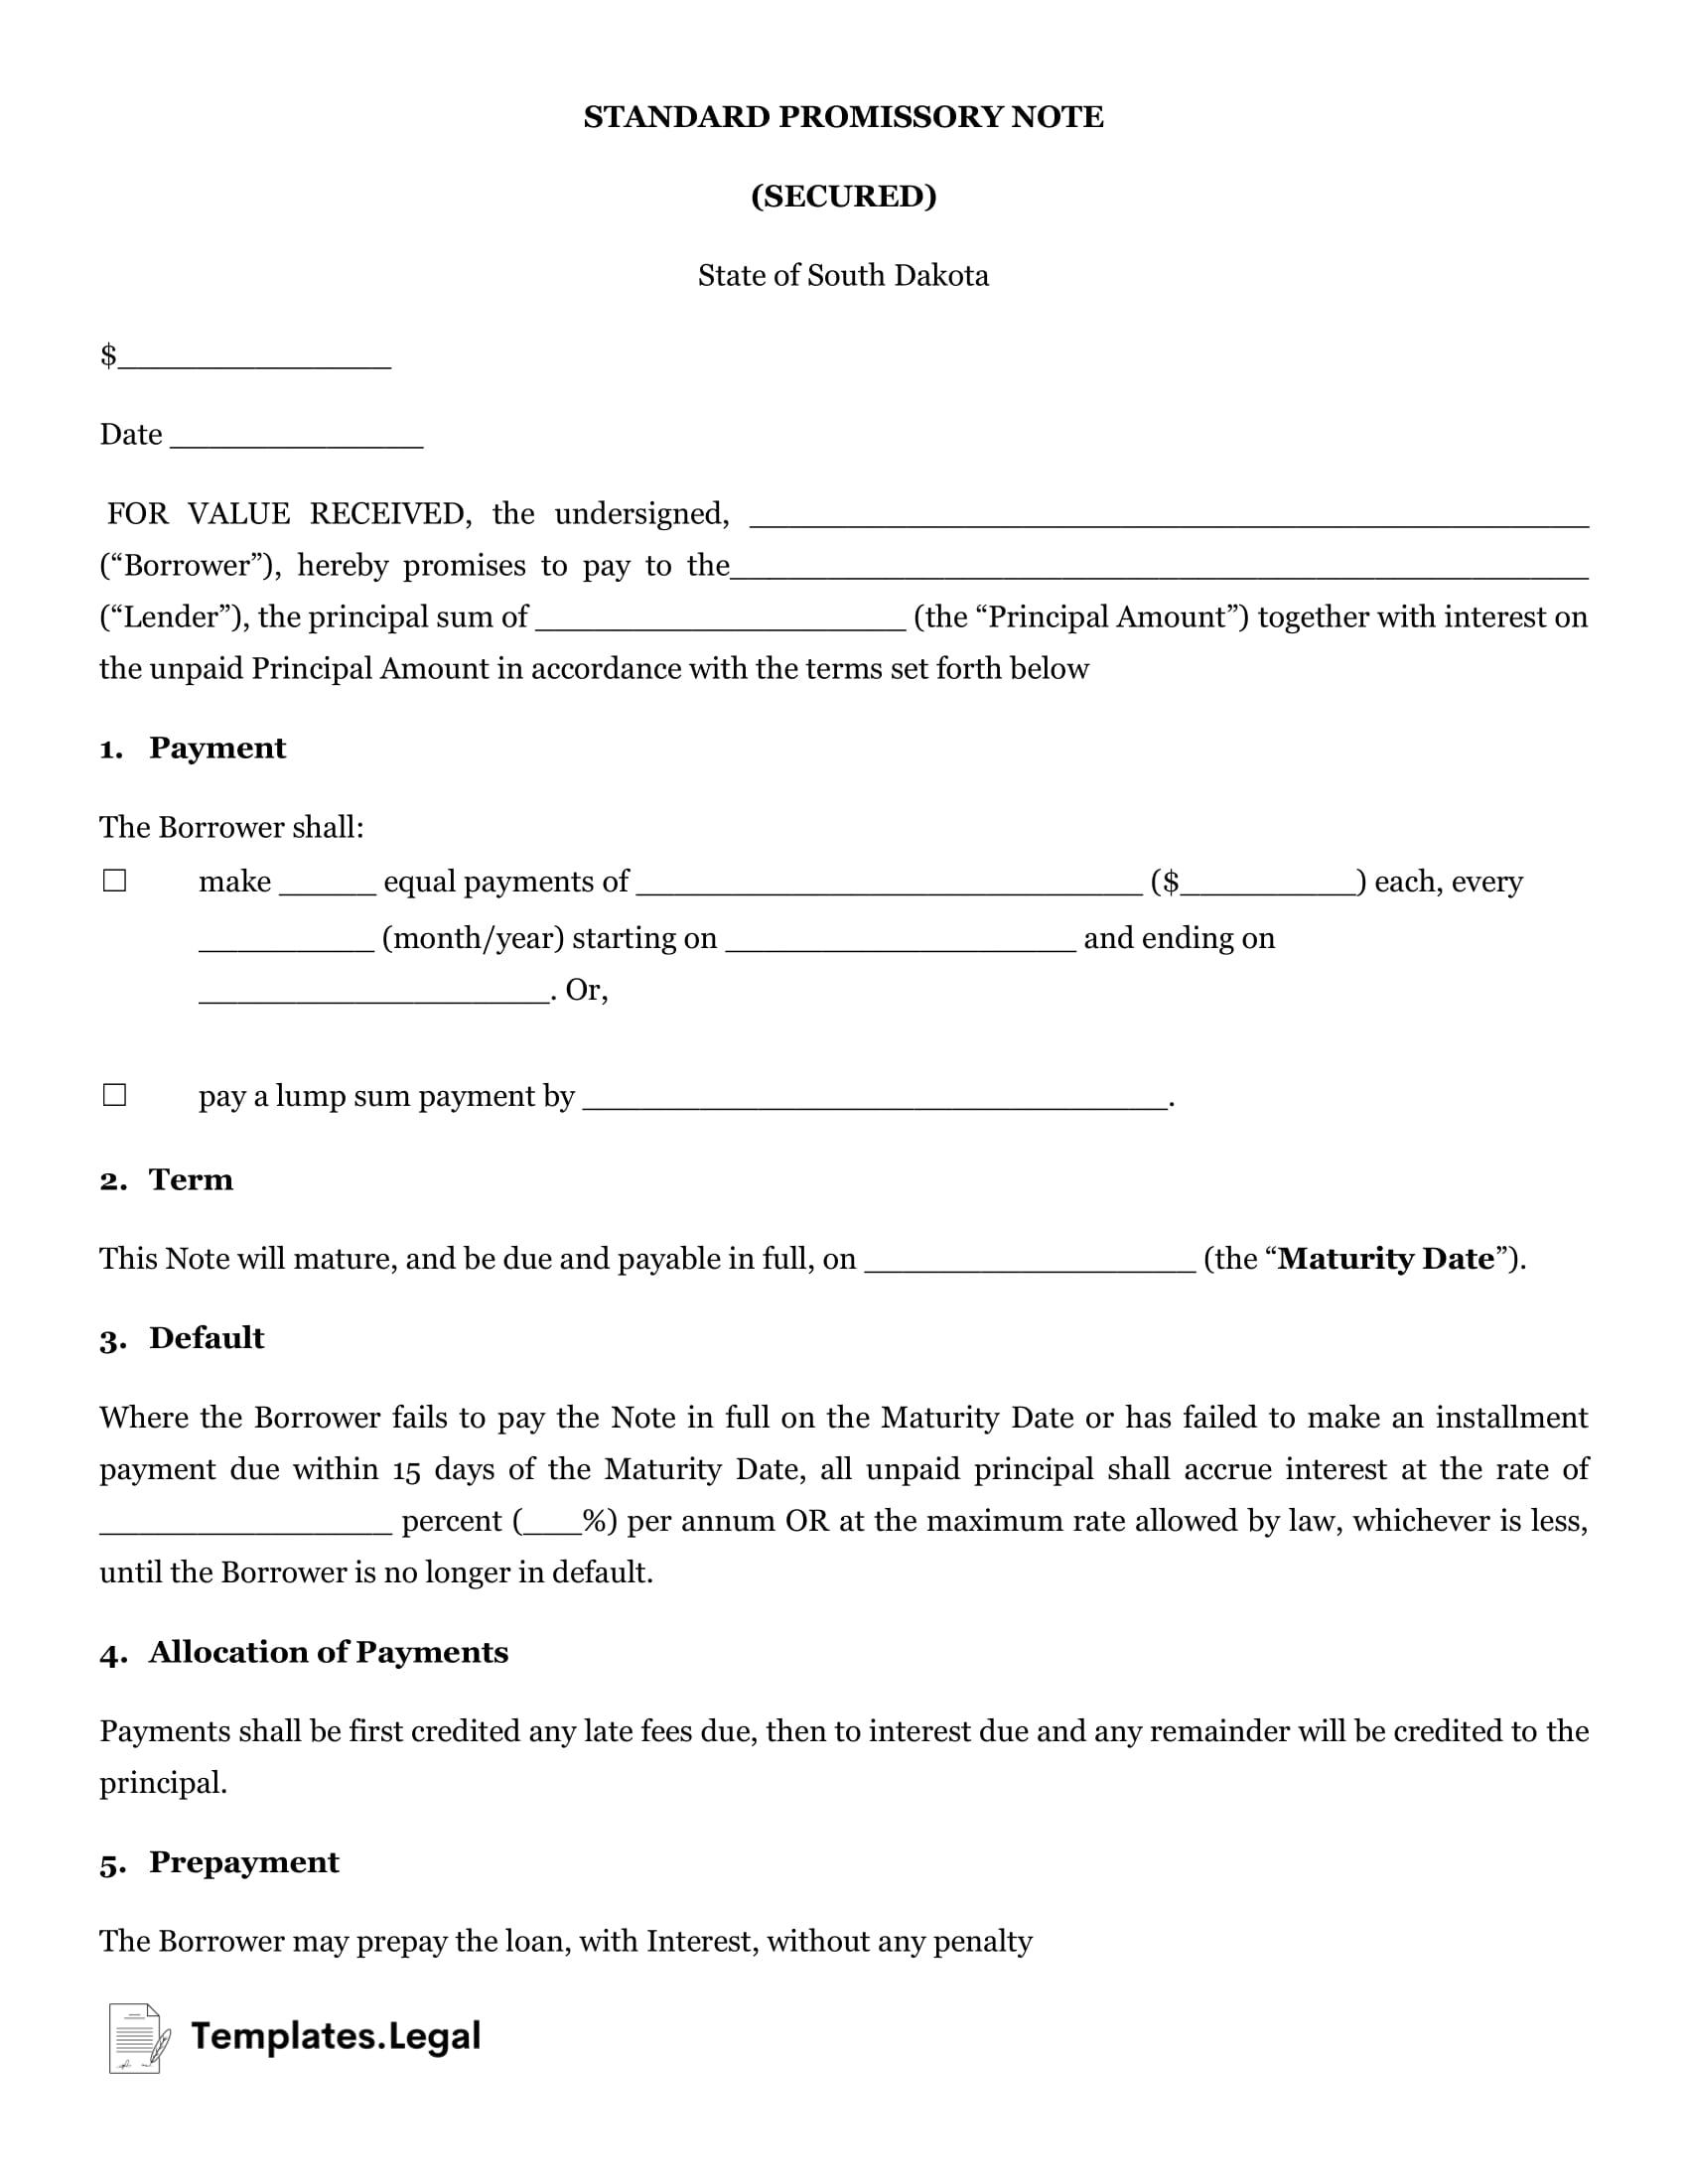 South Dakota Secured Promissory Note - Templates.Legal